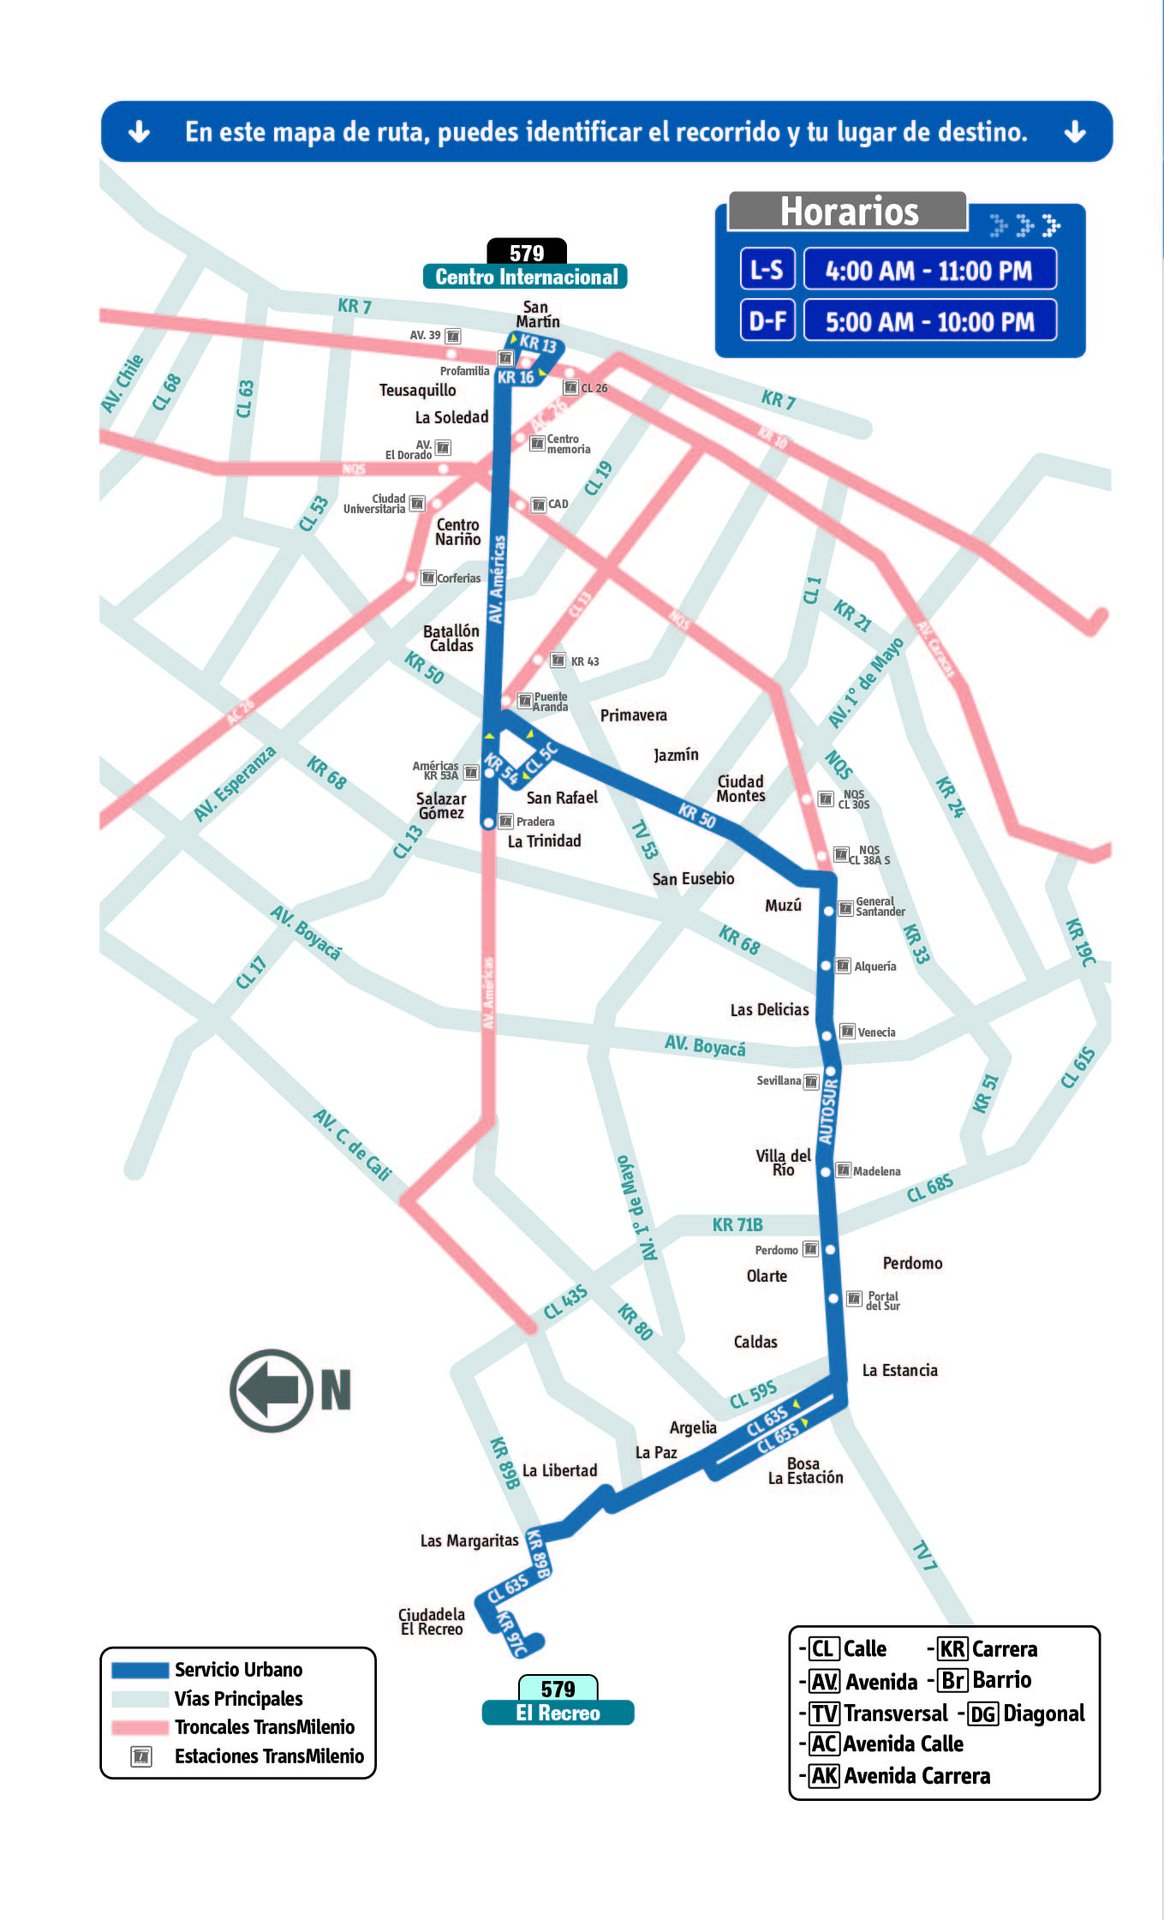 Ruta SITP: 579 El Recreo ↔ Centro Internacional [Urbana] 7